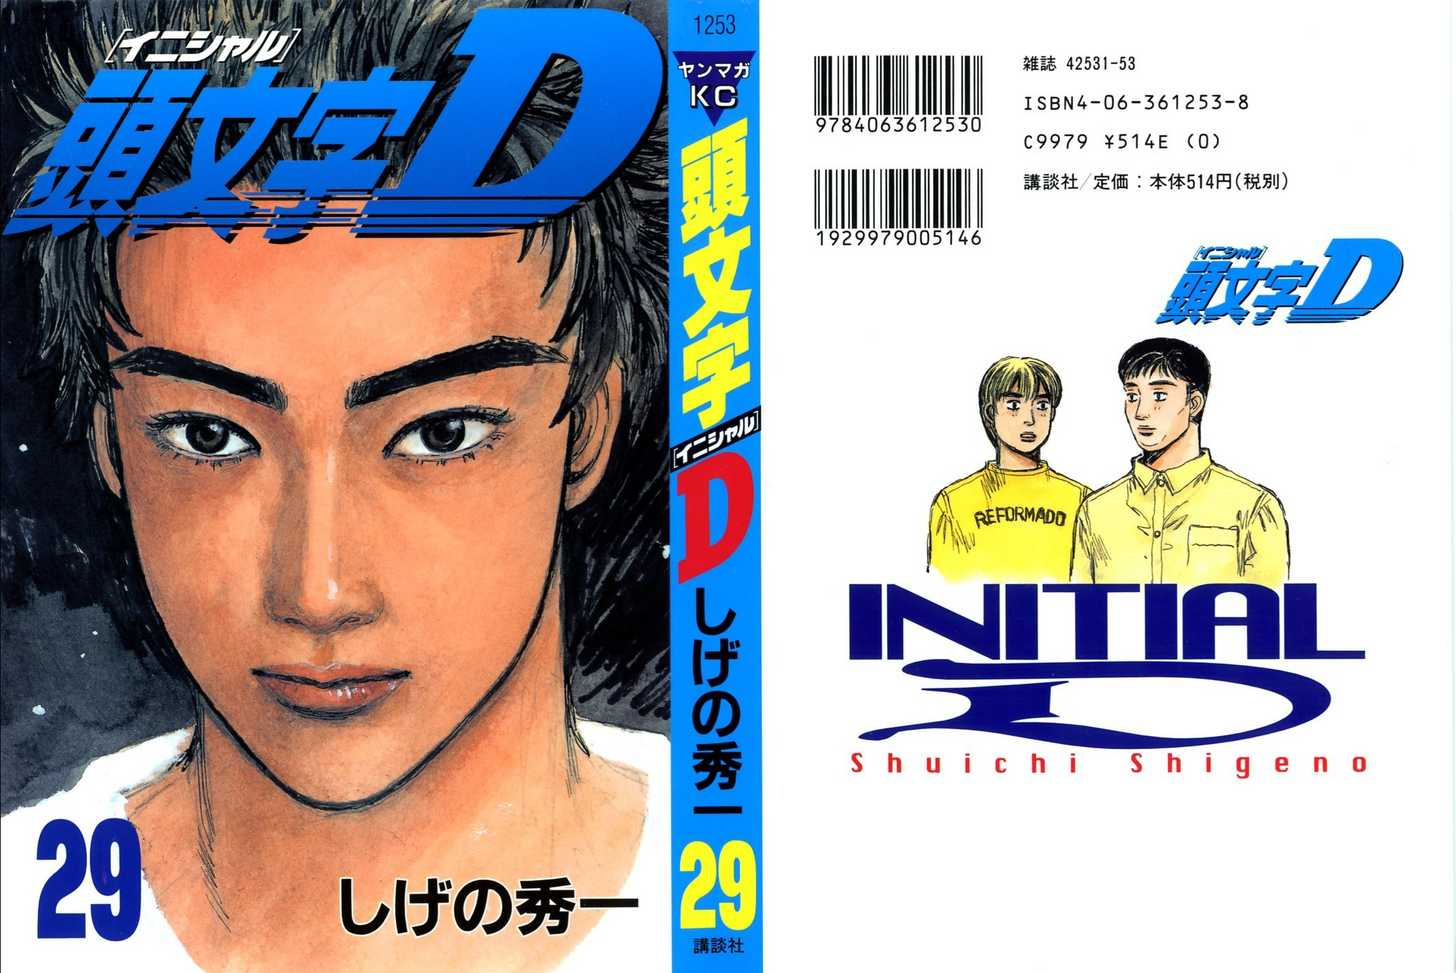 https://im.nineanime.com/comics/pic9/61/2493/61055/InitialD3740760.jpg Page 1